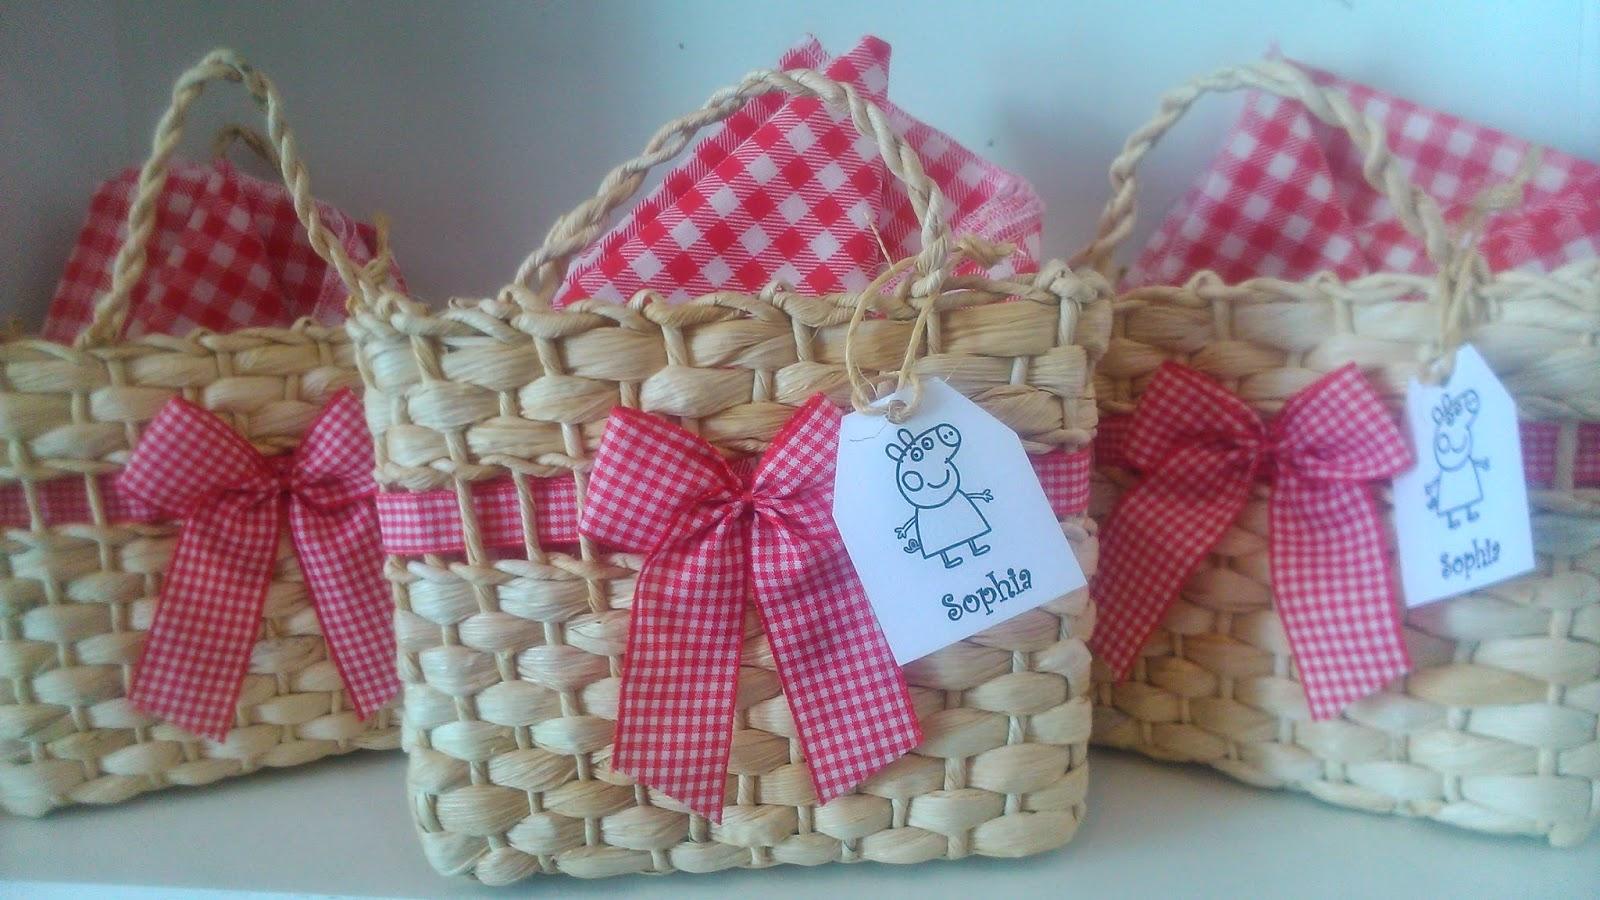 Bolsa De Festa Branca : Atelie de ideia bolsa palha infantil